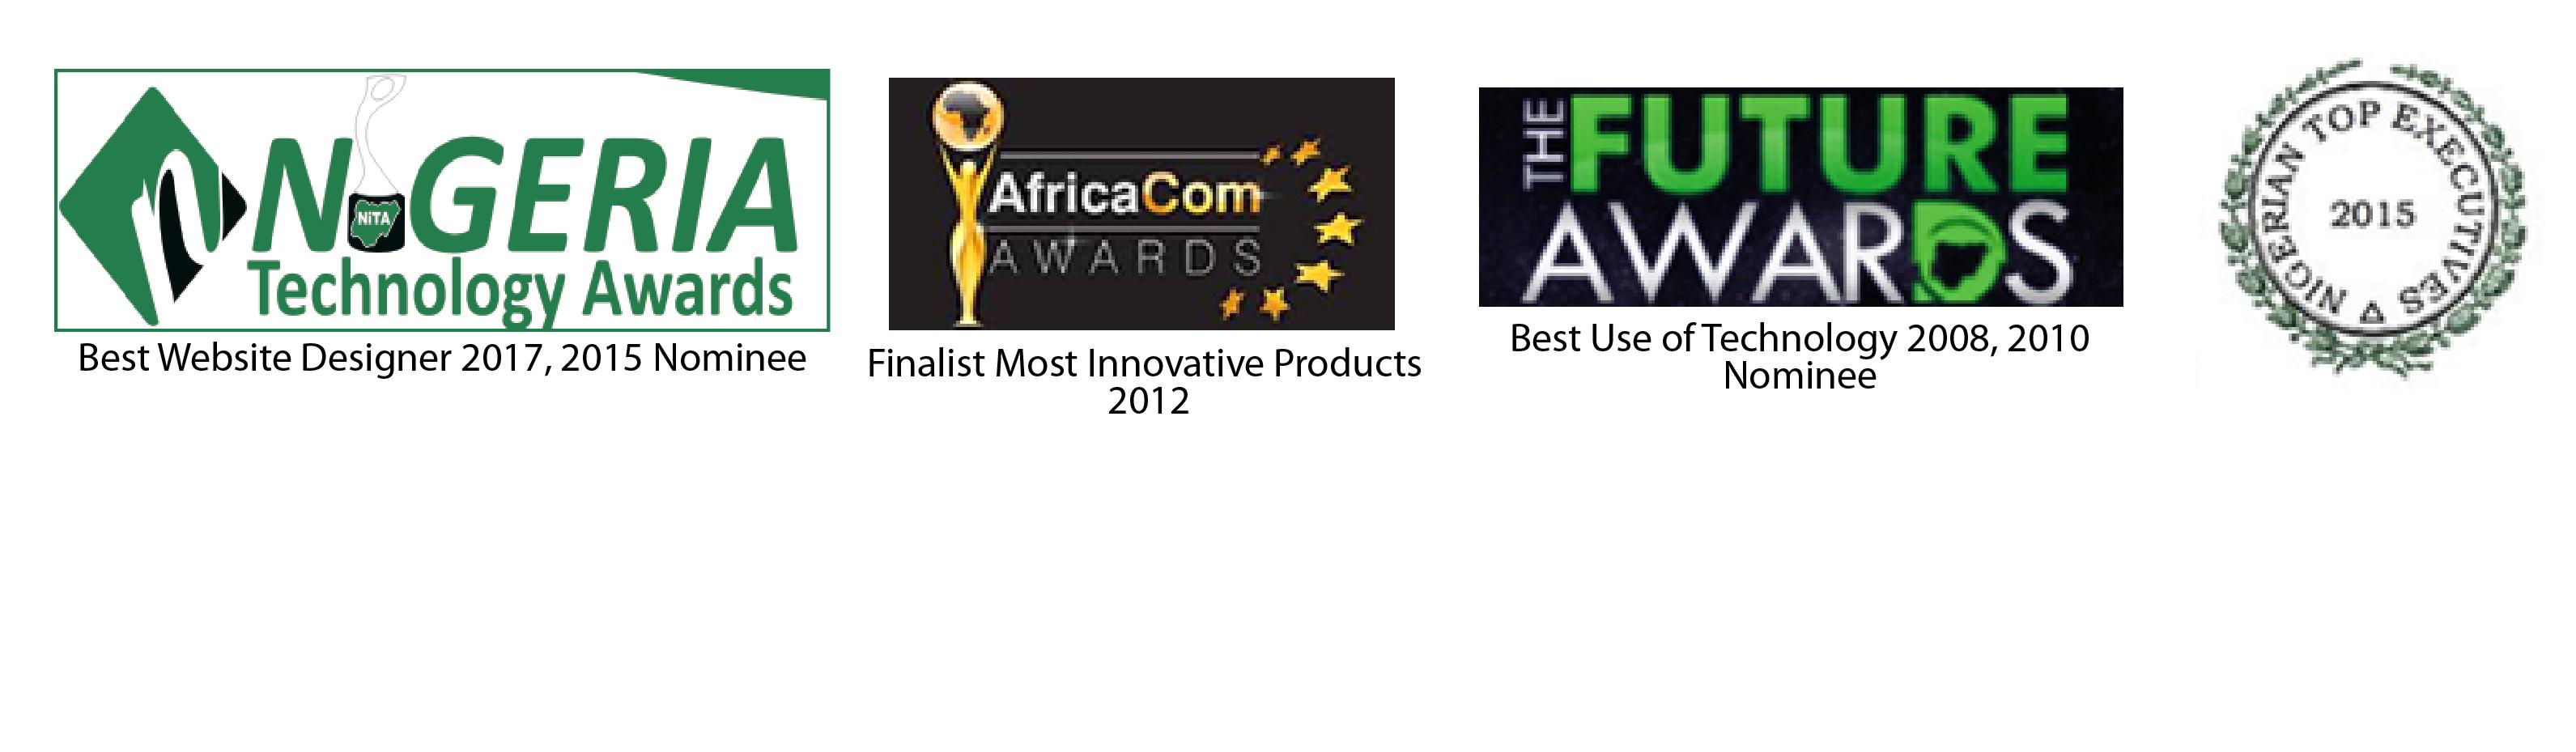 Winner Nigeria Technology Awards